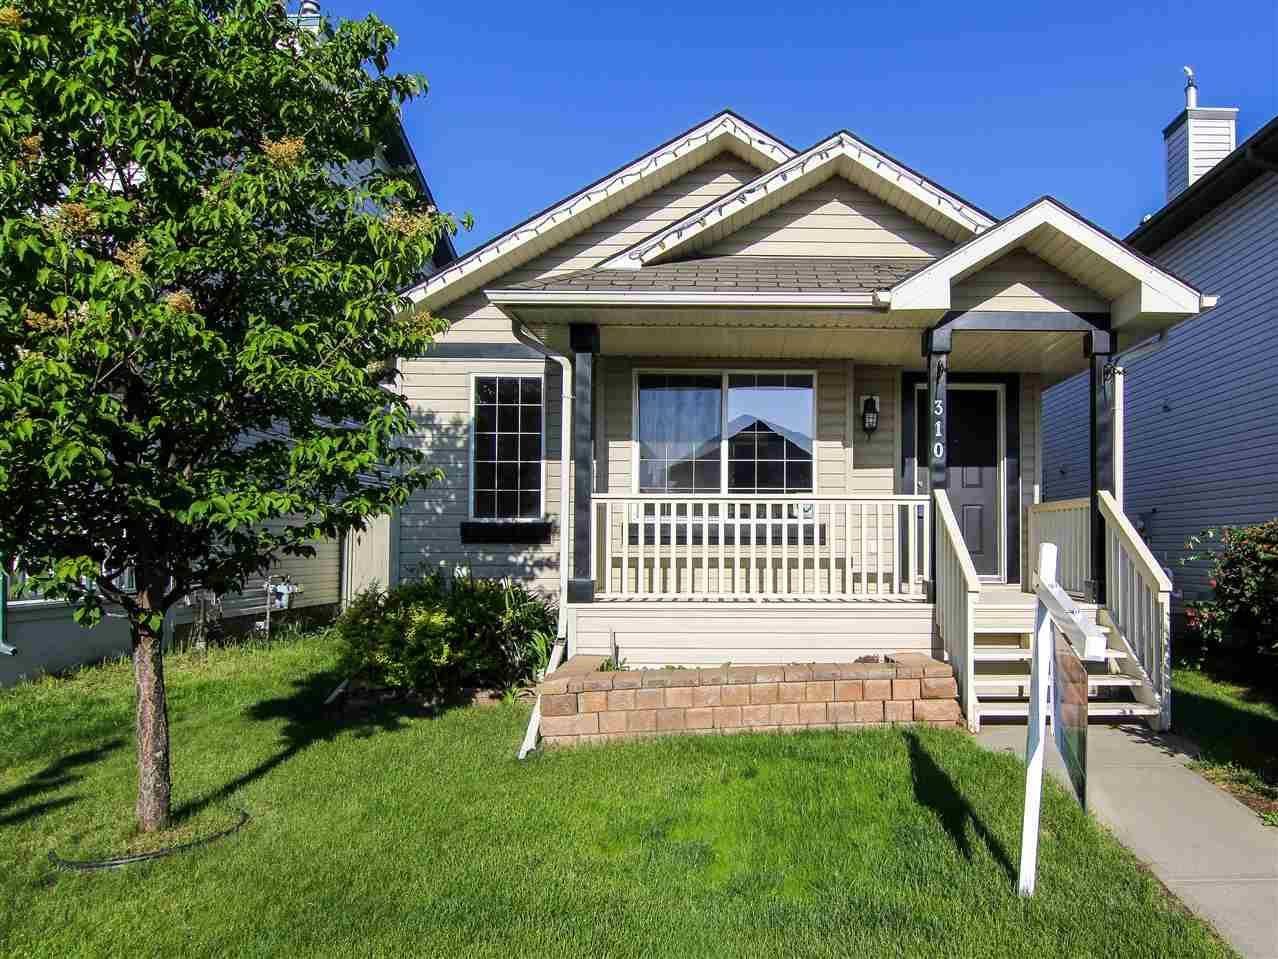 House for sale at 310 85 St Sw Edmonton Alberta - MLS: E4159756